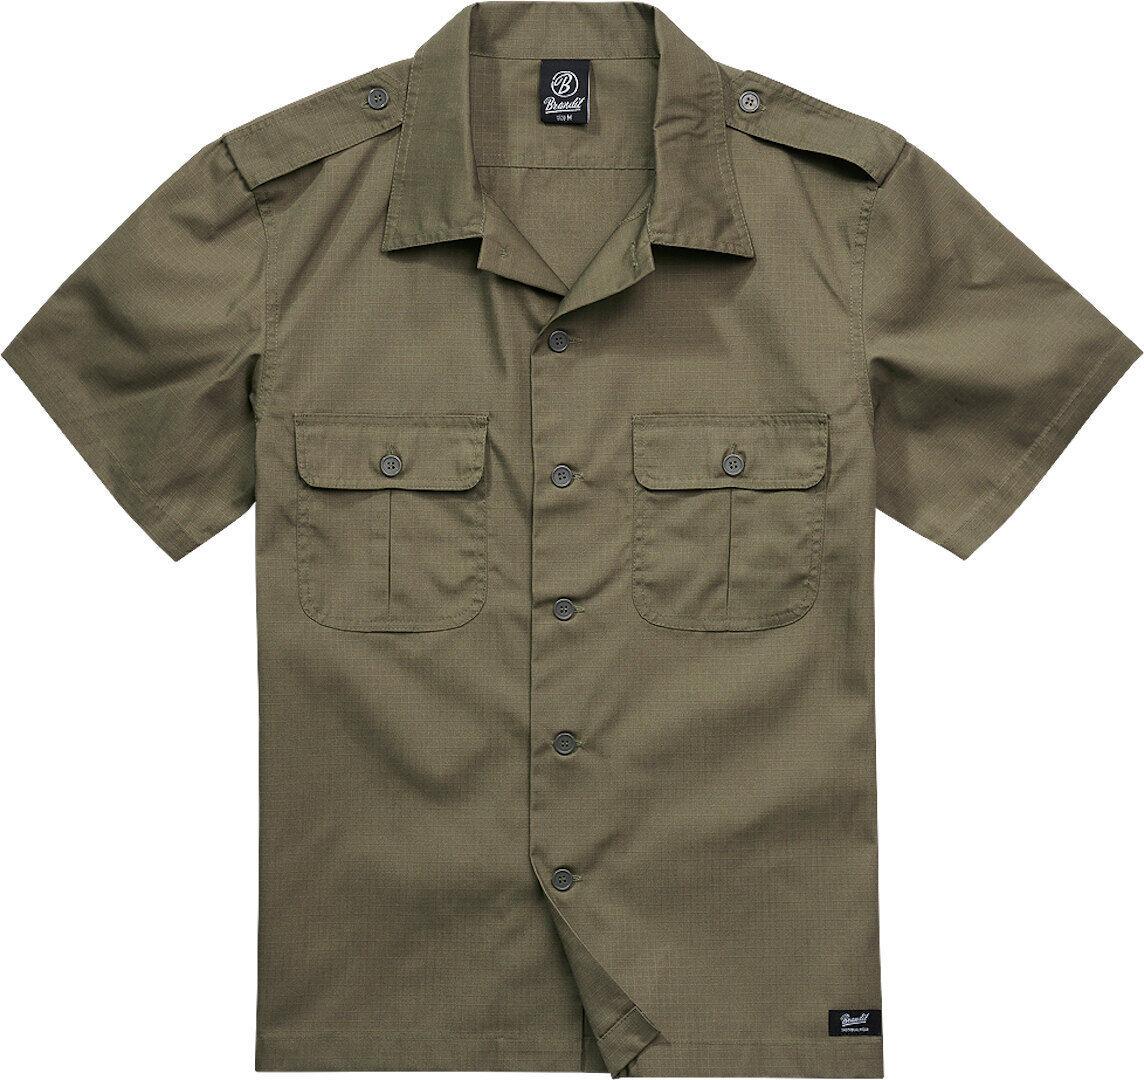 Brandit US Ripstop Paita  - Vihreä - Size: 2XL